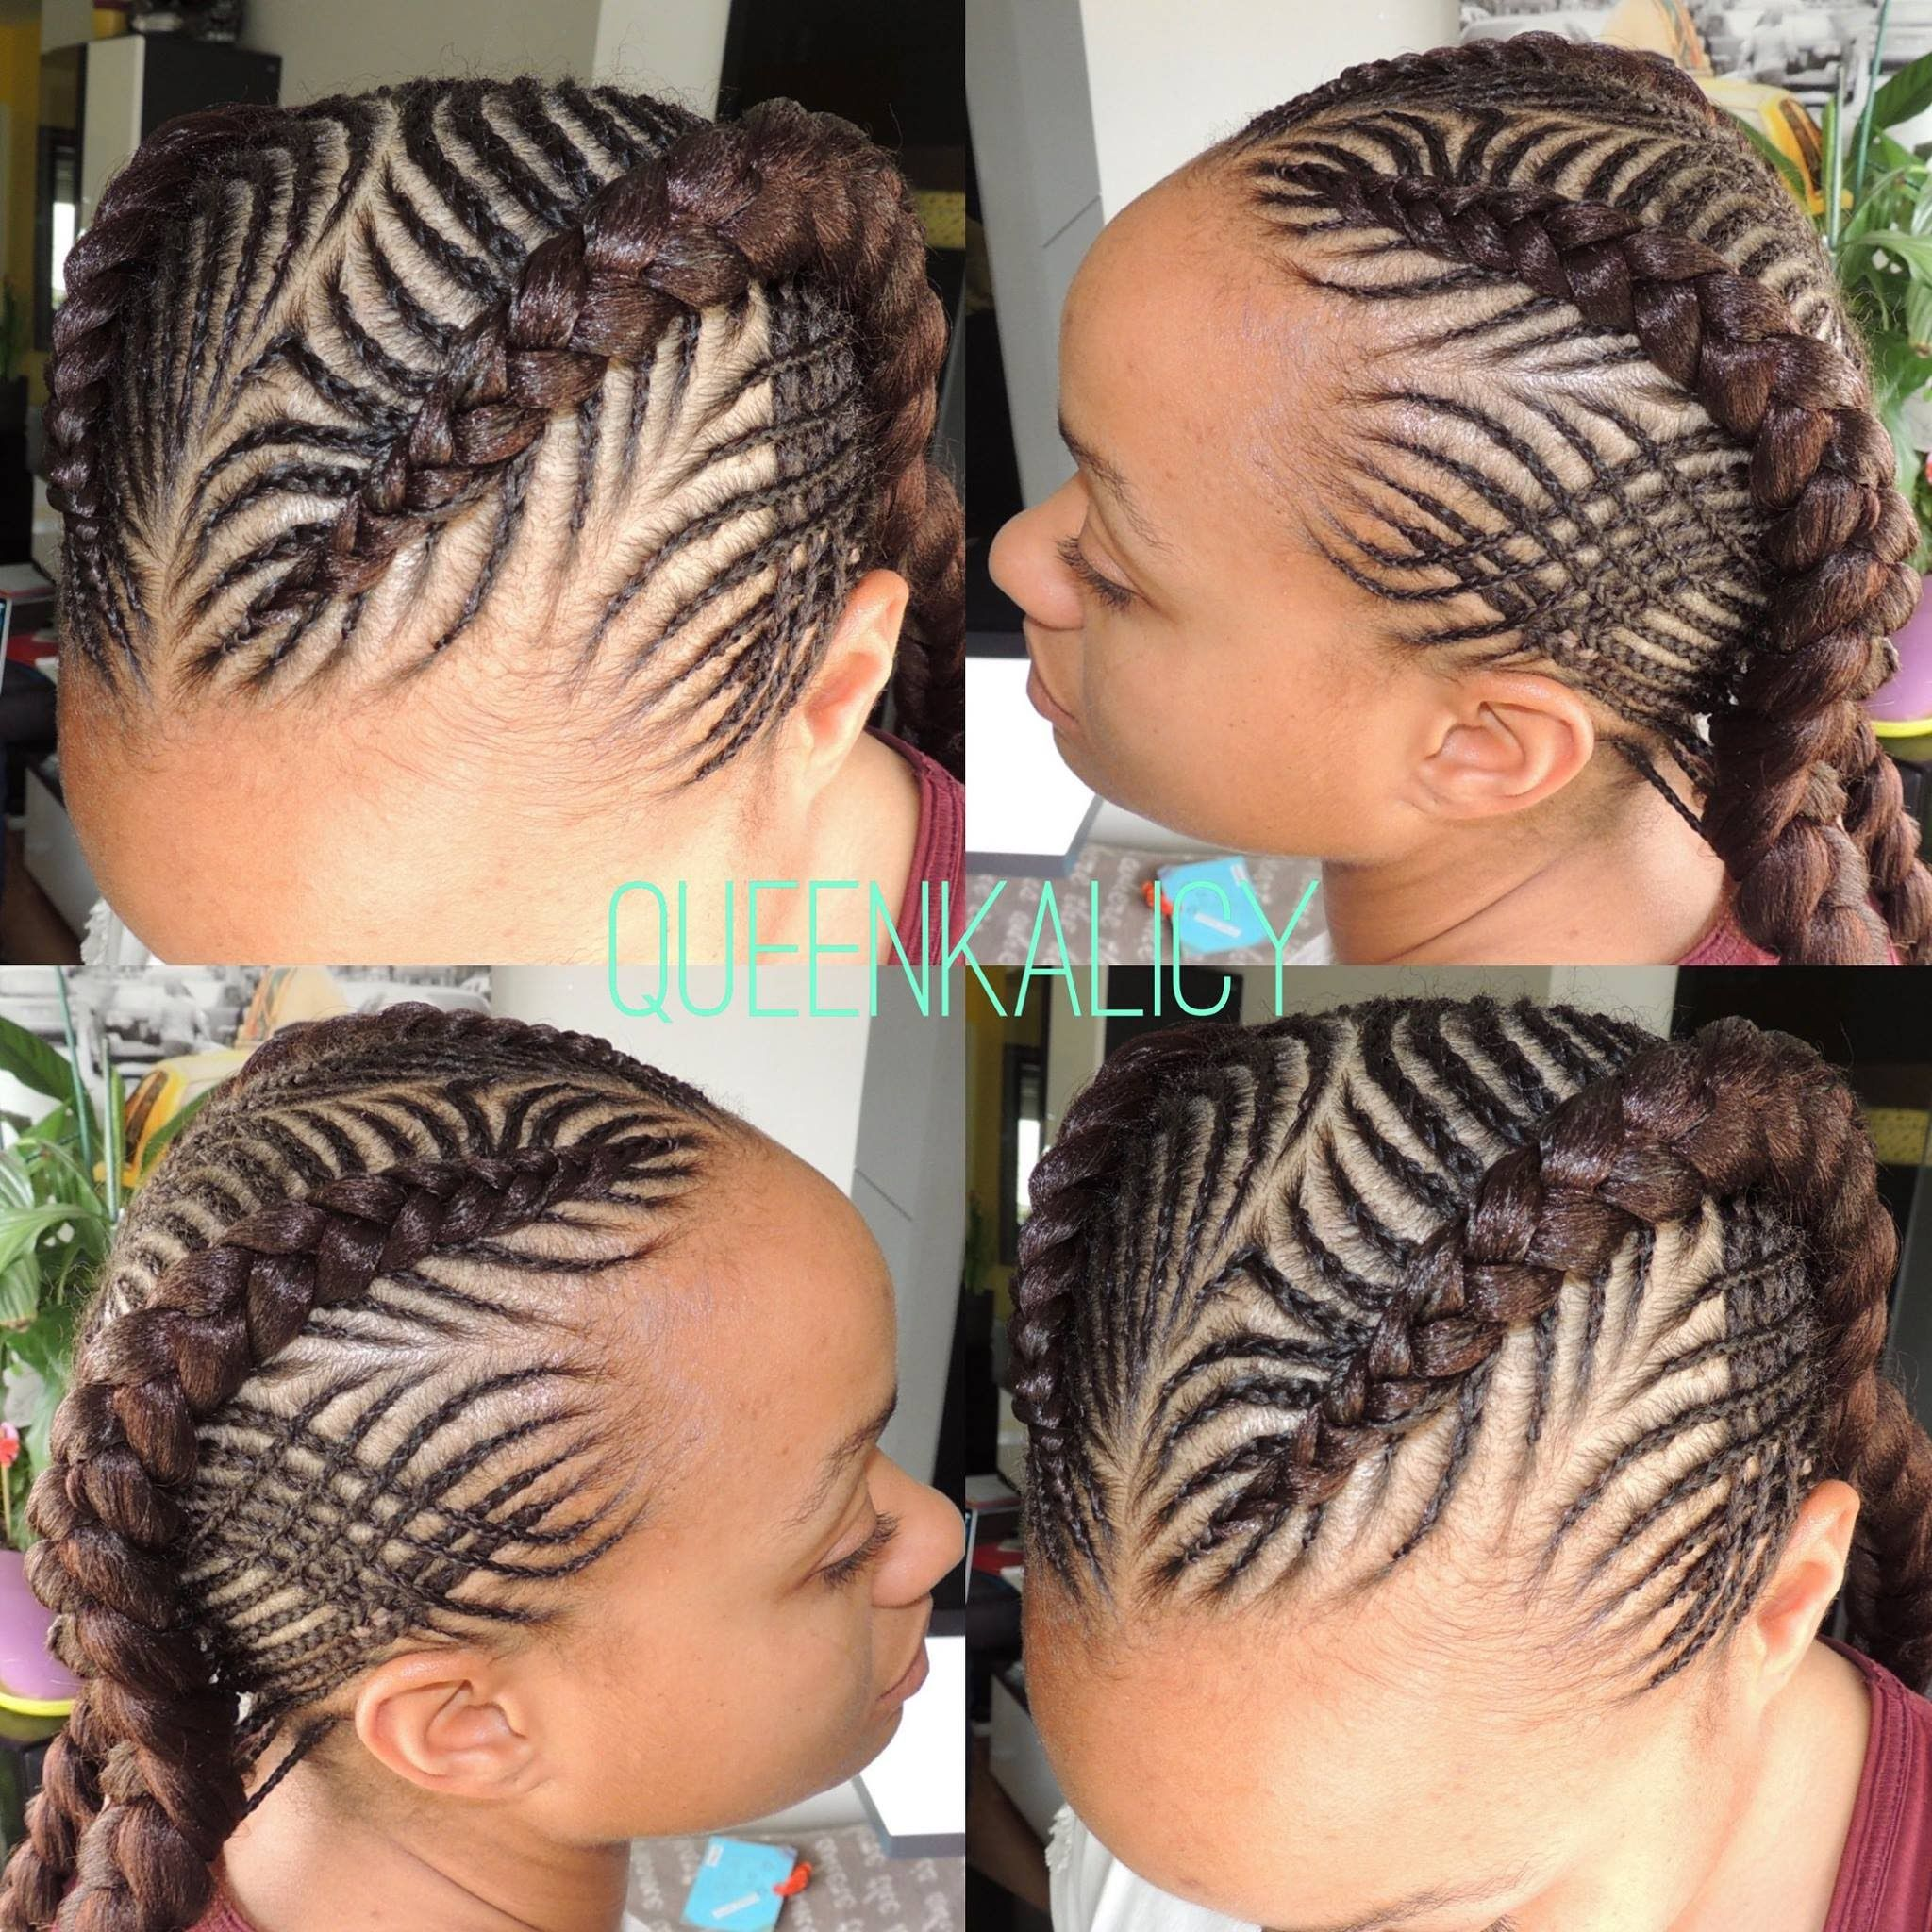 Fishbone Braids Cornrows Hair Styles African Braids Hairstyles Braided Hairstyles